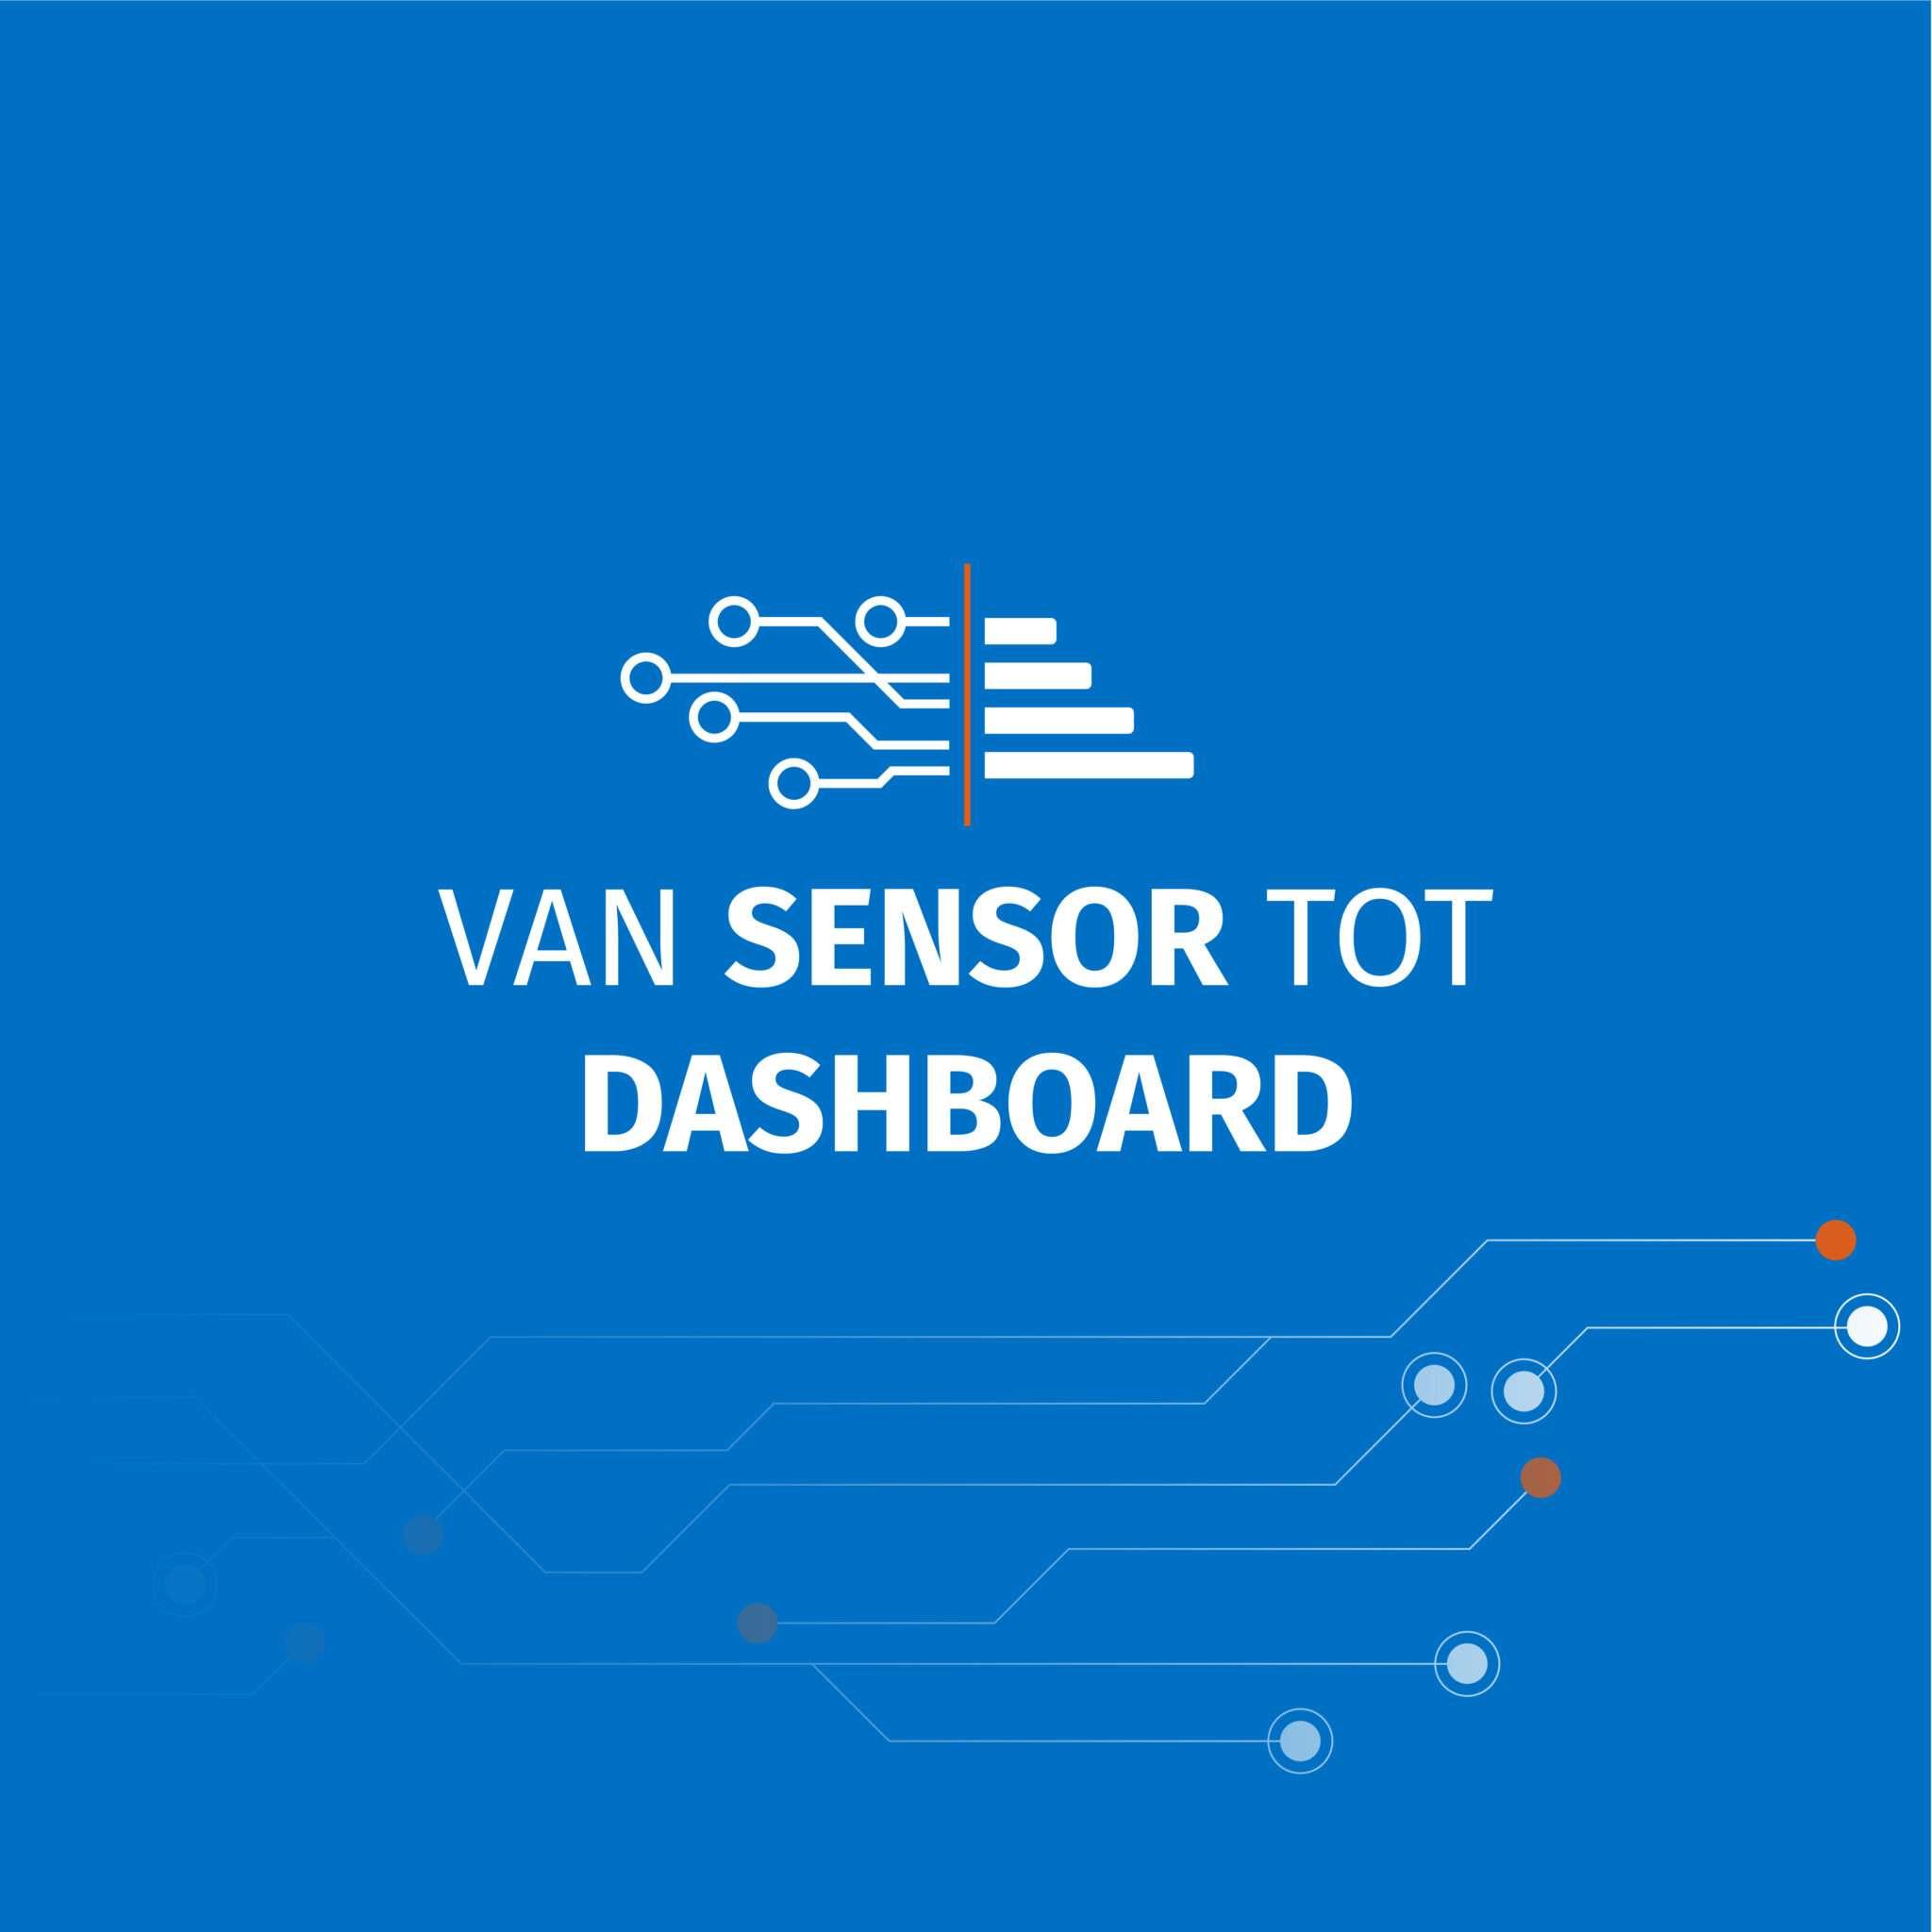 210203 - VTM - Logo van sensor tot dashboard white - JPEG-09